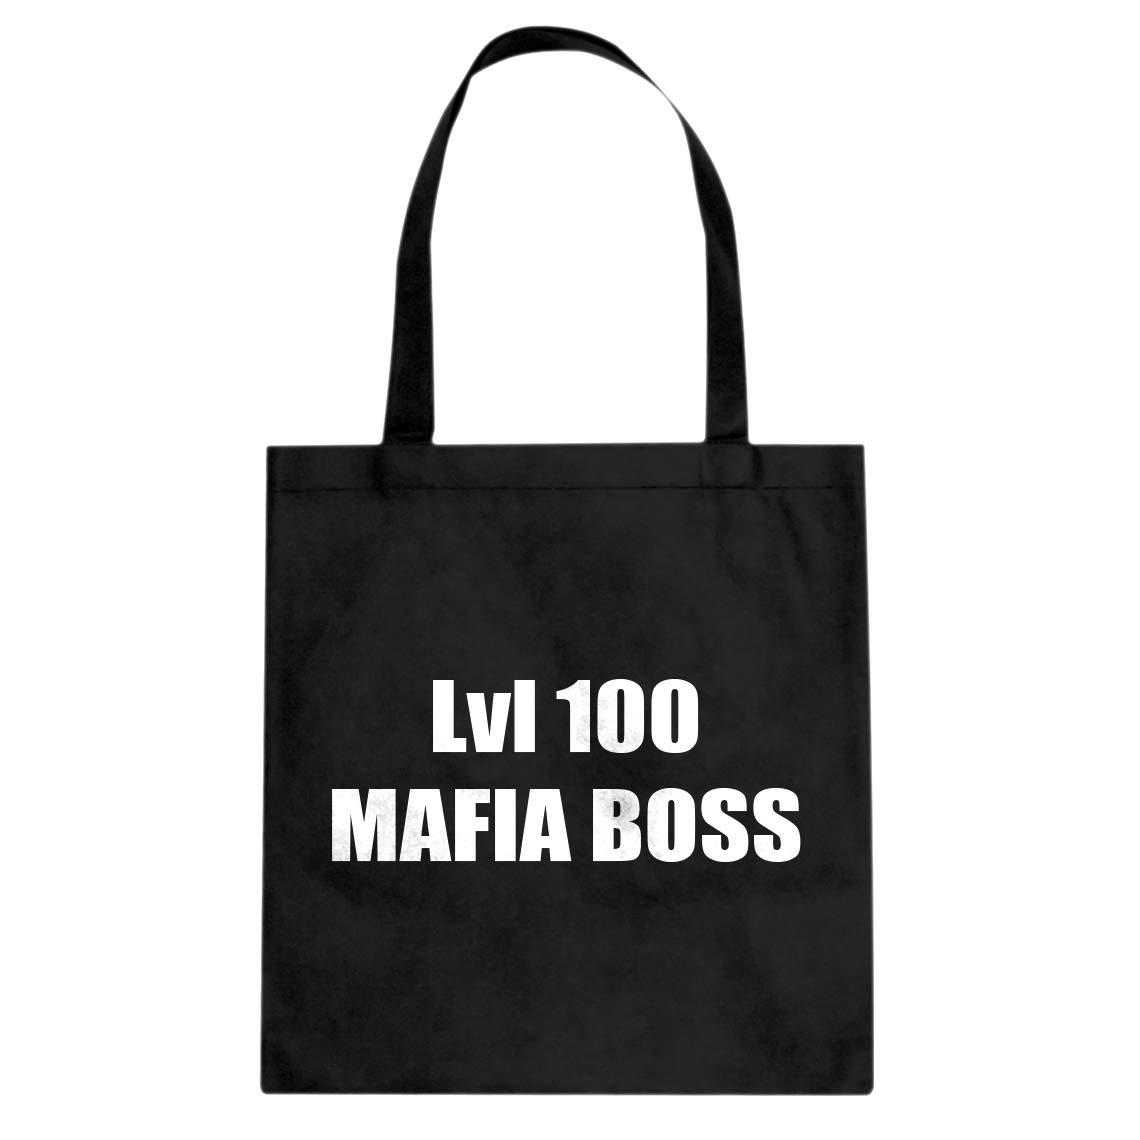 Indica Plateau Lvl 100 Mafia Boss Cotton Canvas Tote Bag